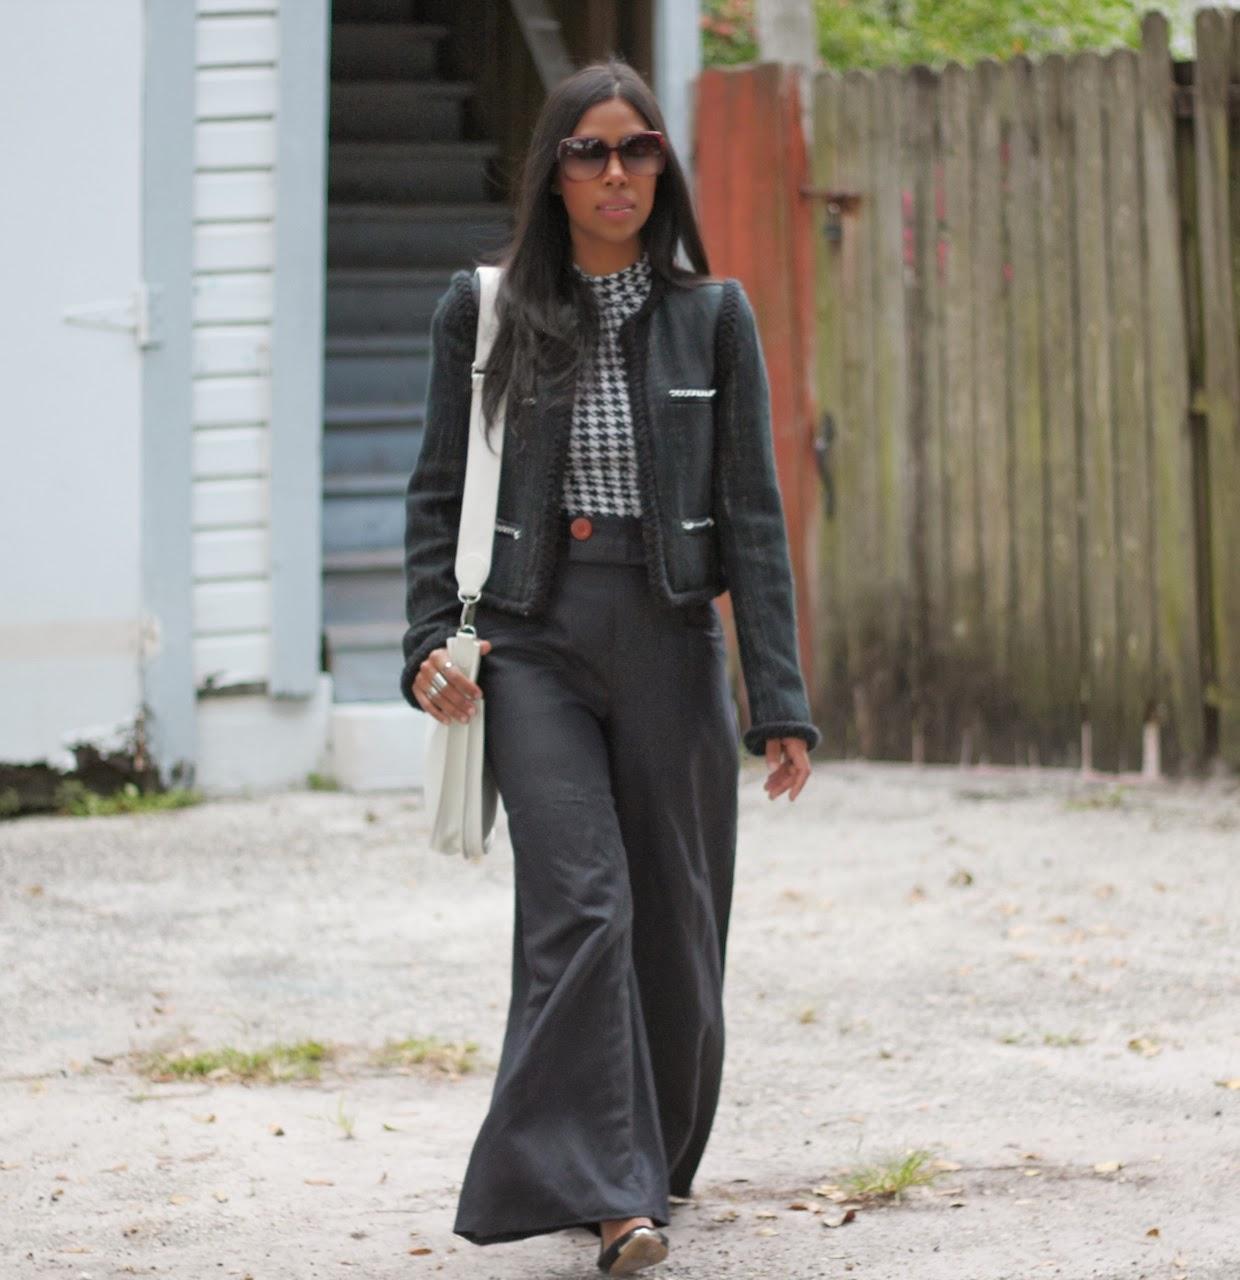 chanel hermes bag sunglasses tweed malene birger jacket fall fashion white bag houndstooth